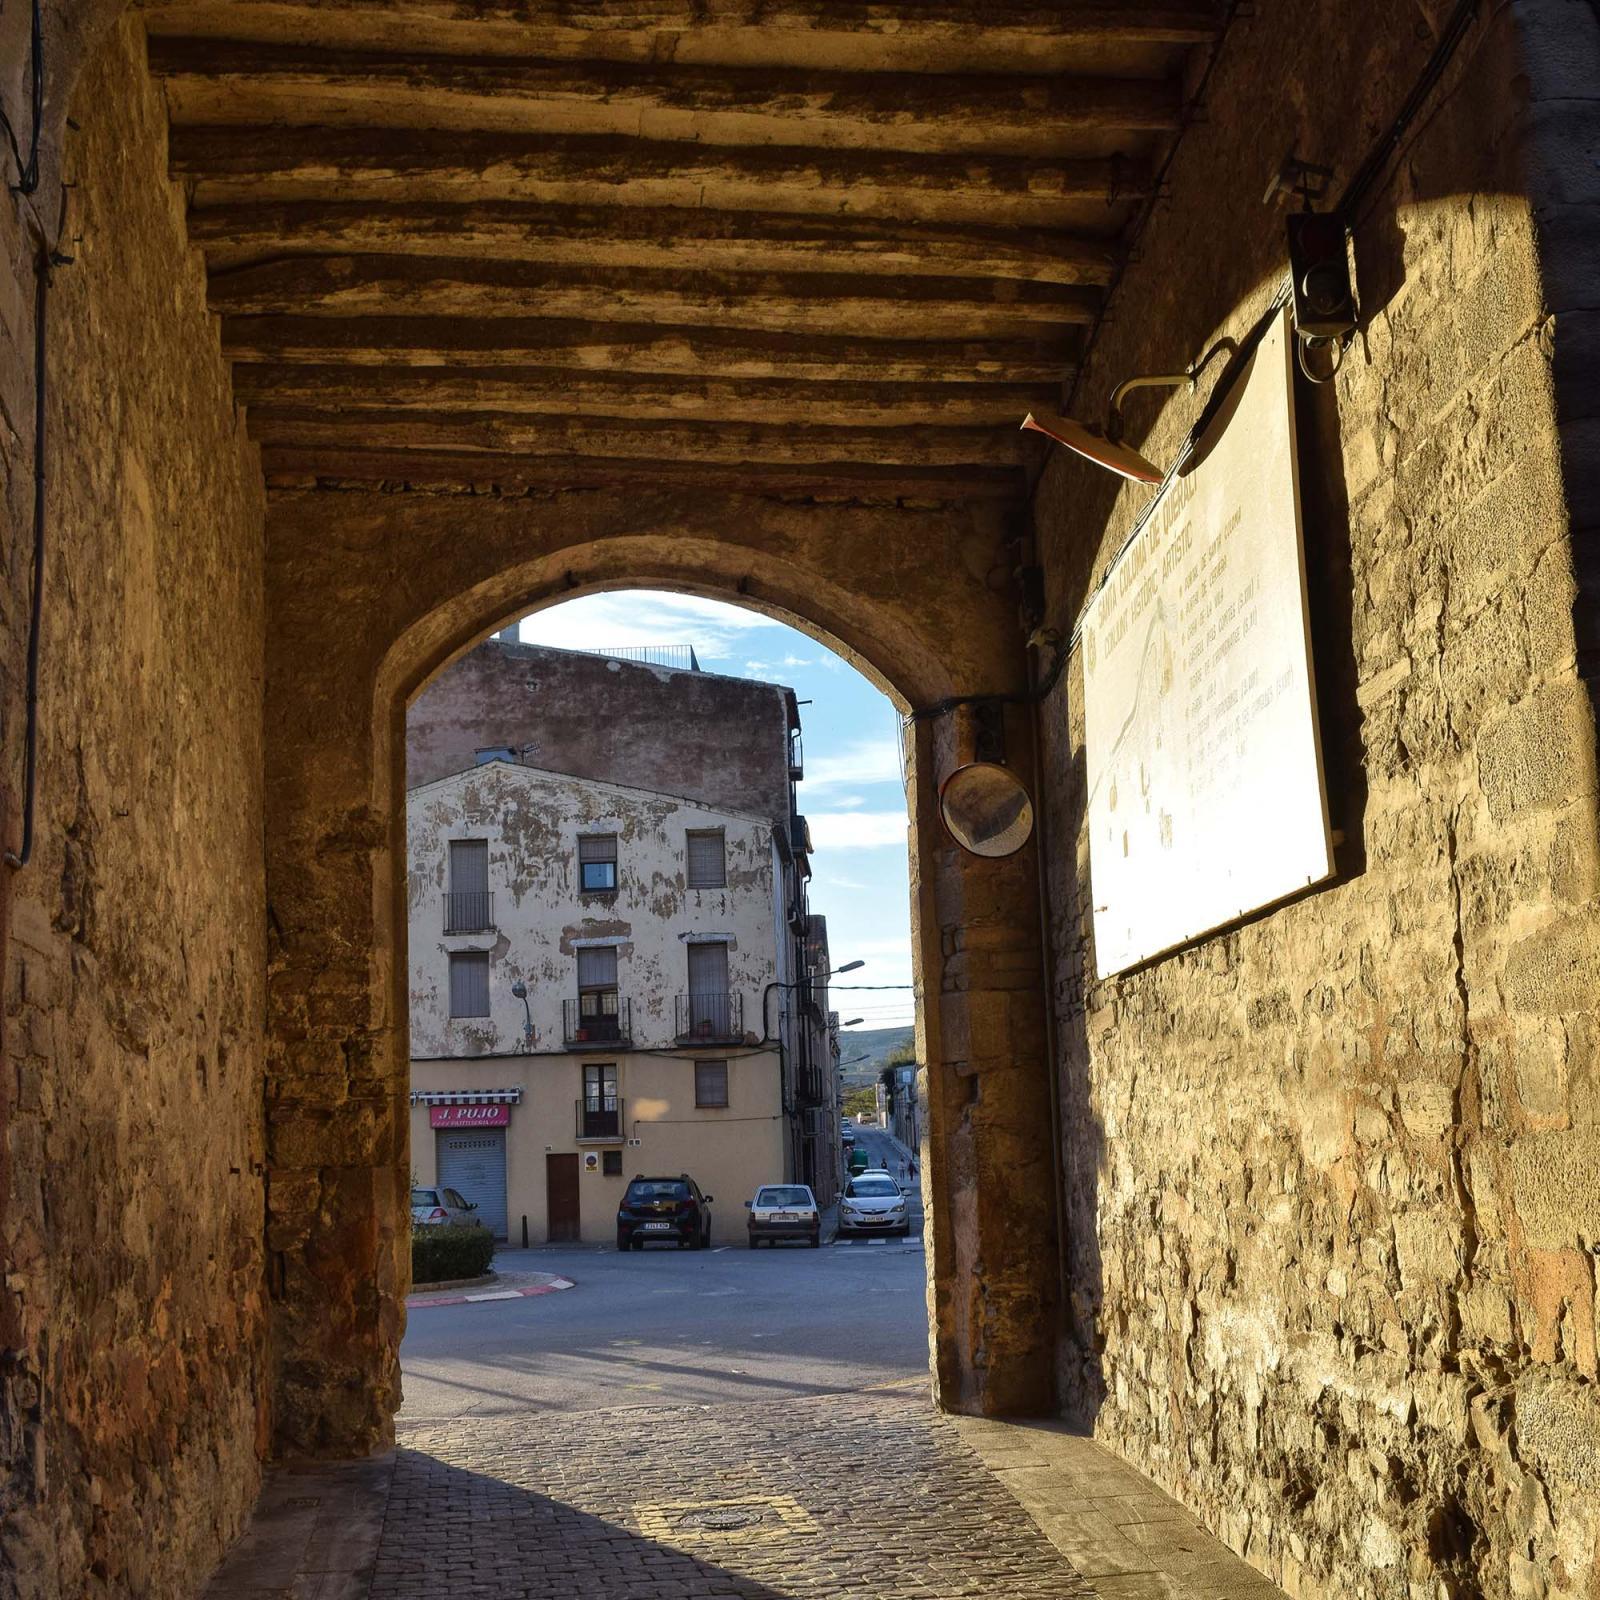 Portal of Santa Coloma